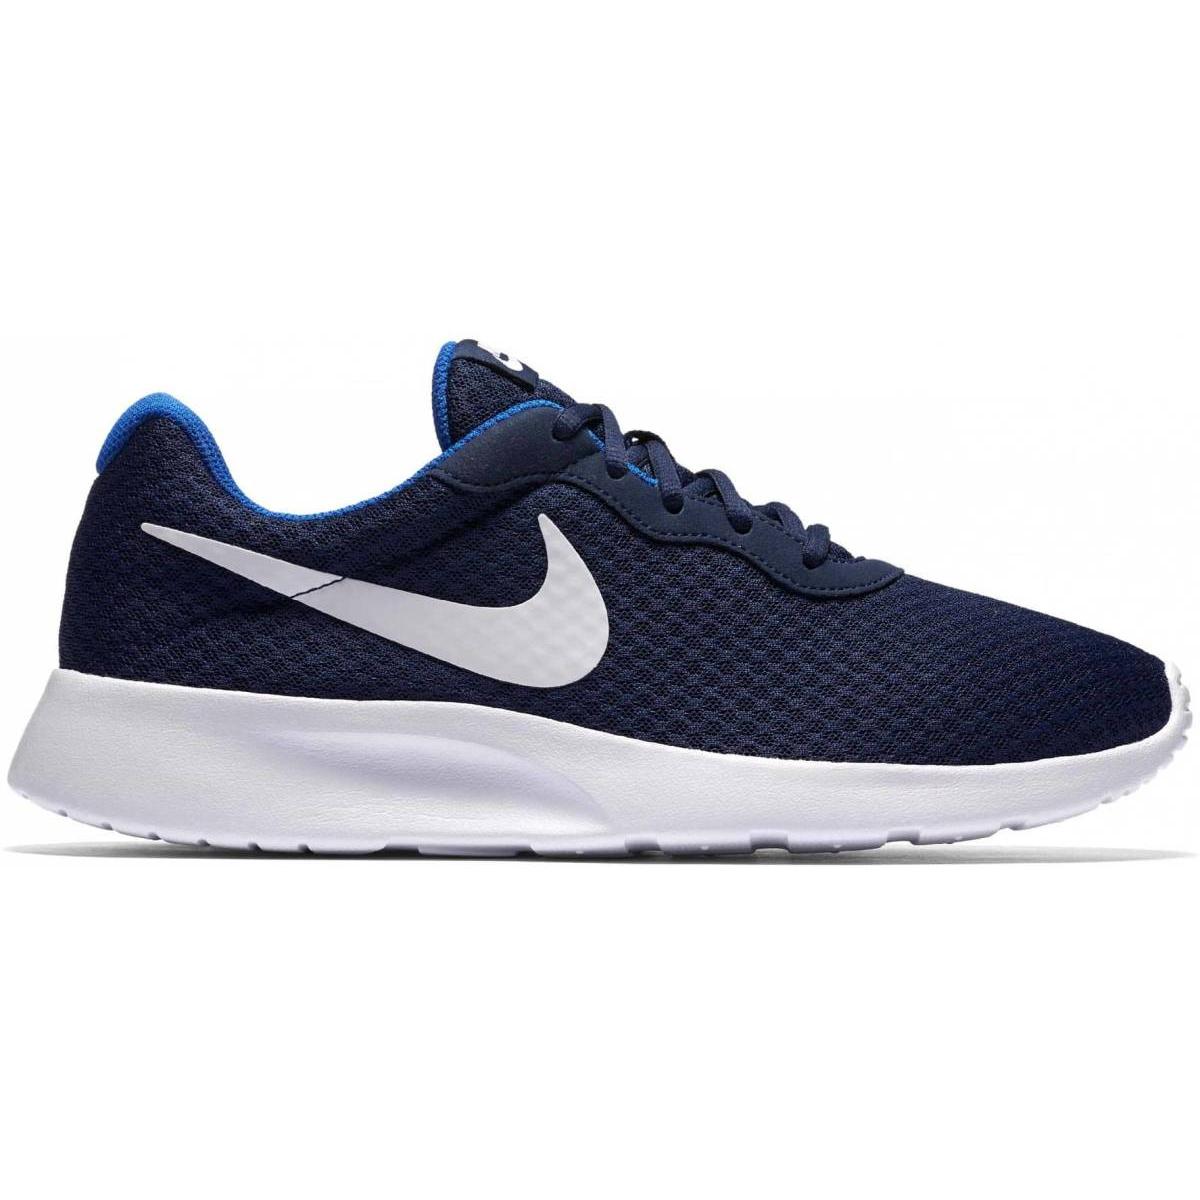 Nike Tanjun Sneaker blau weiß